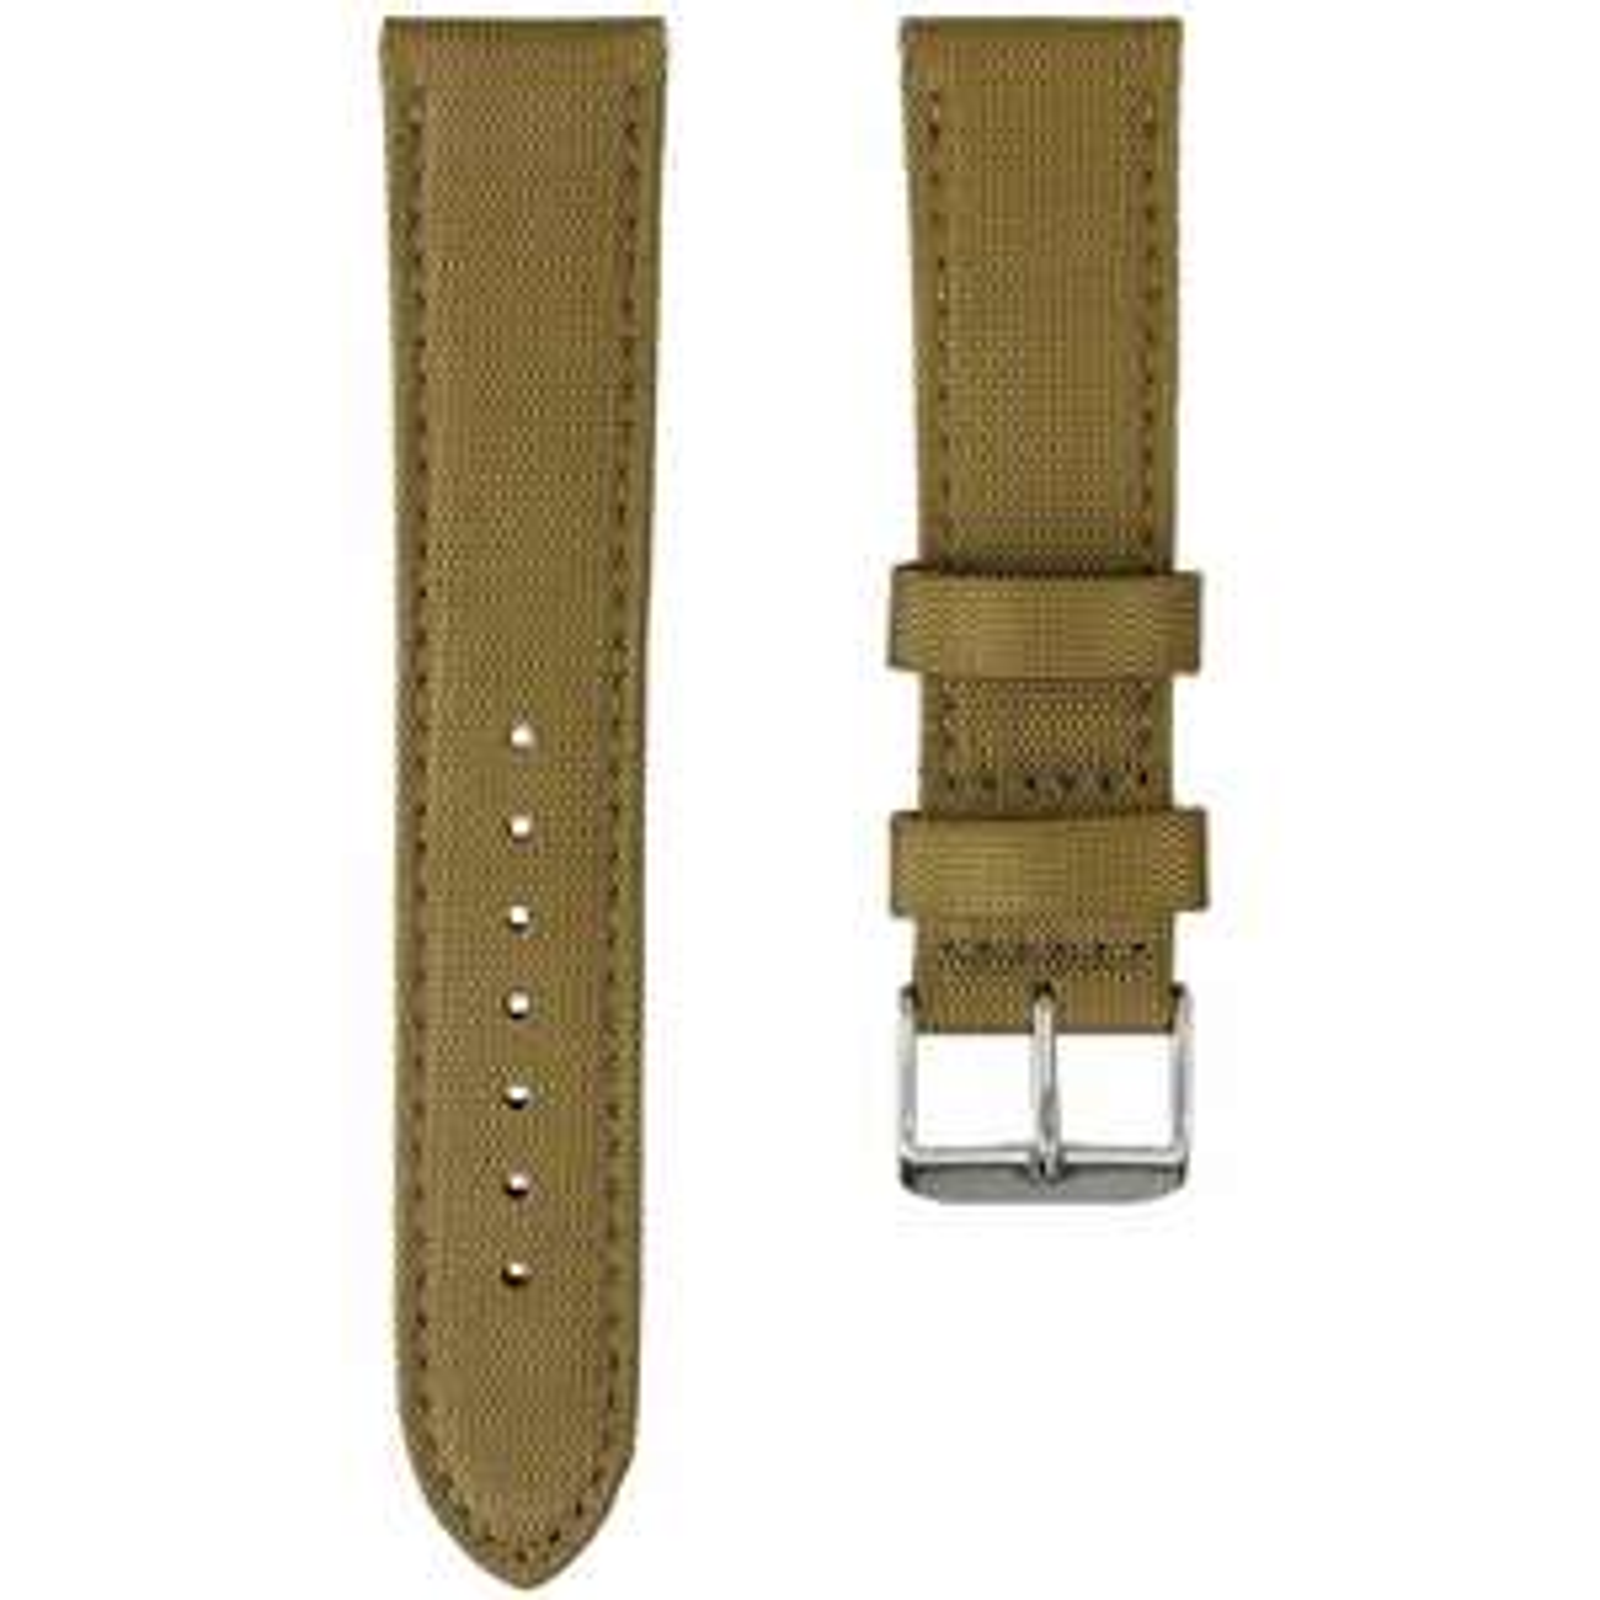 20% Off with eBay with code - eg. Geckota 22mm Nylon Watch Strap £4.80 at WatchGecko